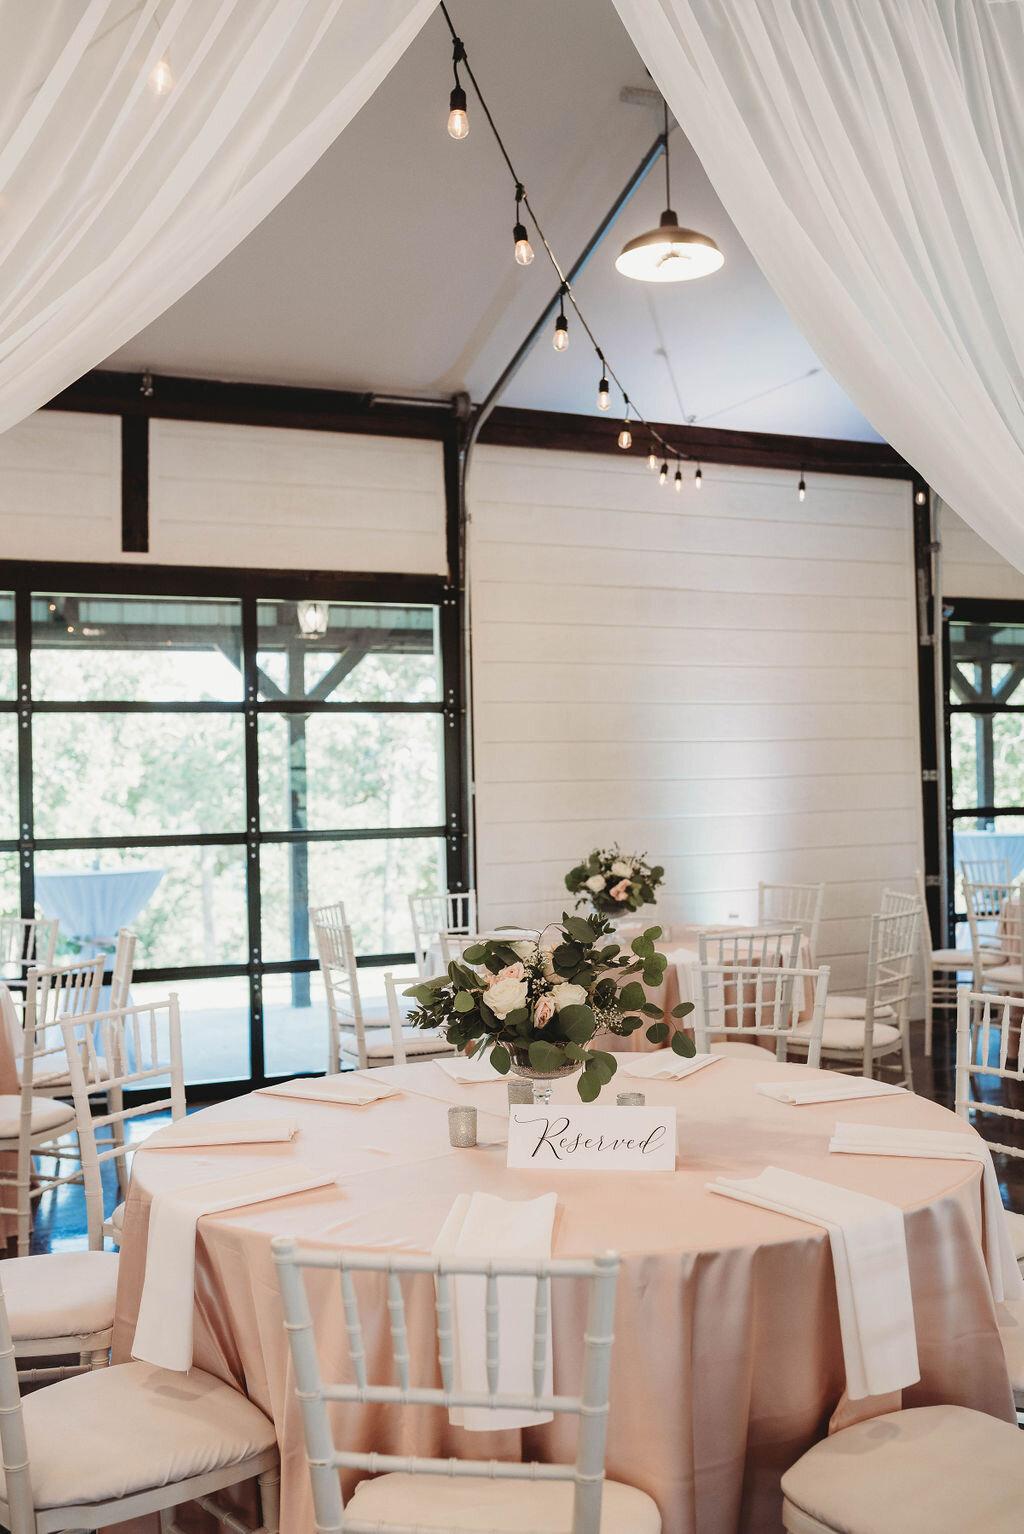 Tulsa Wedding Venue with a View 23.jpg